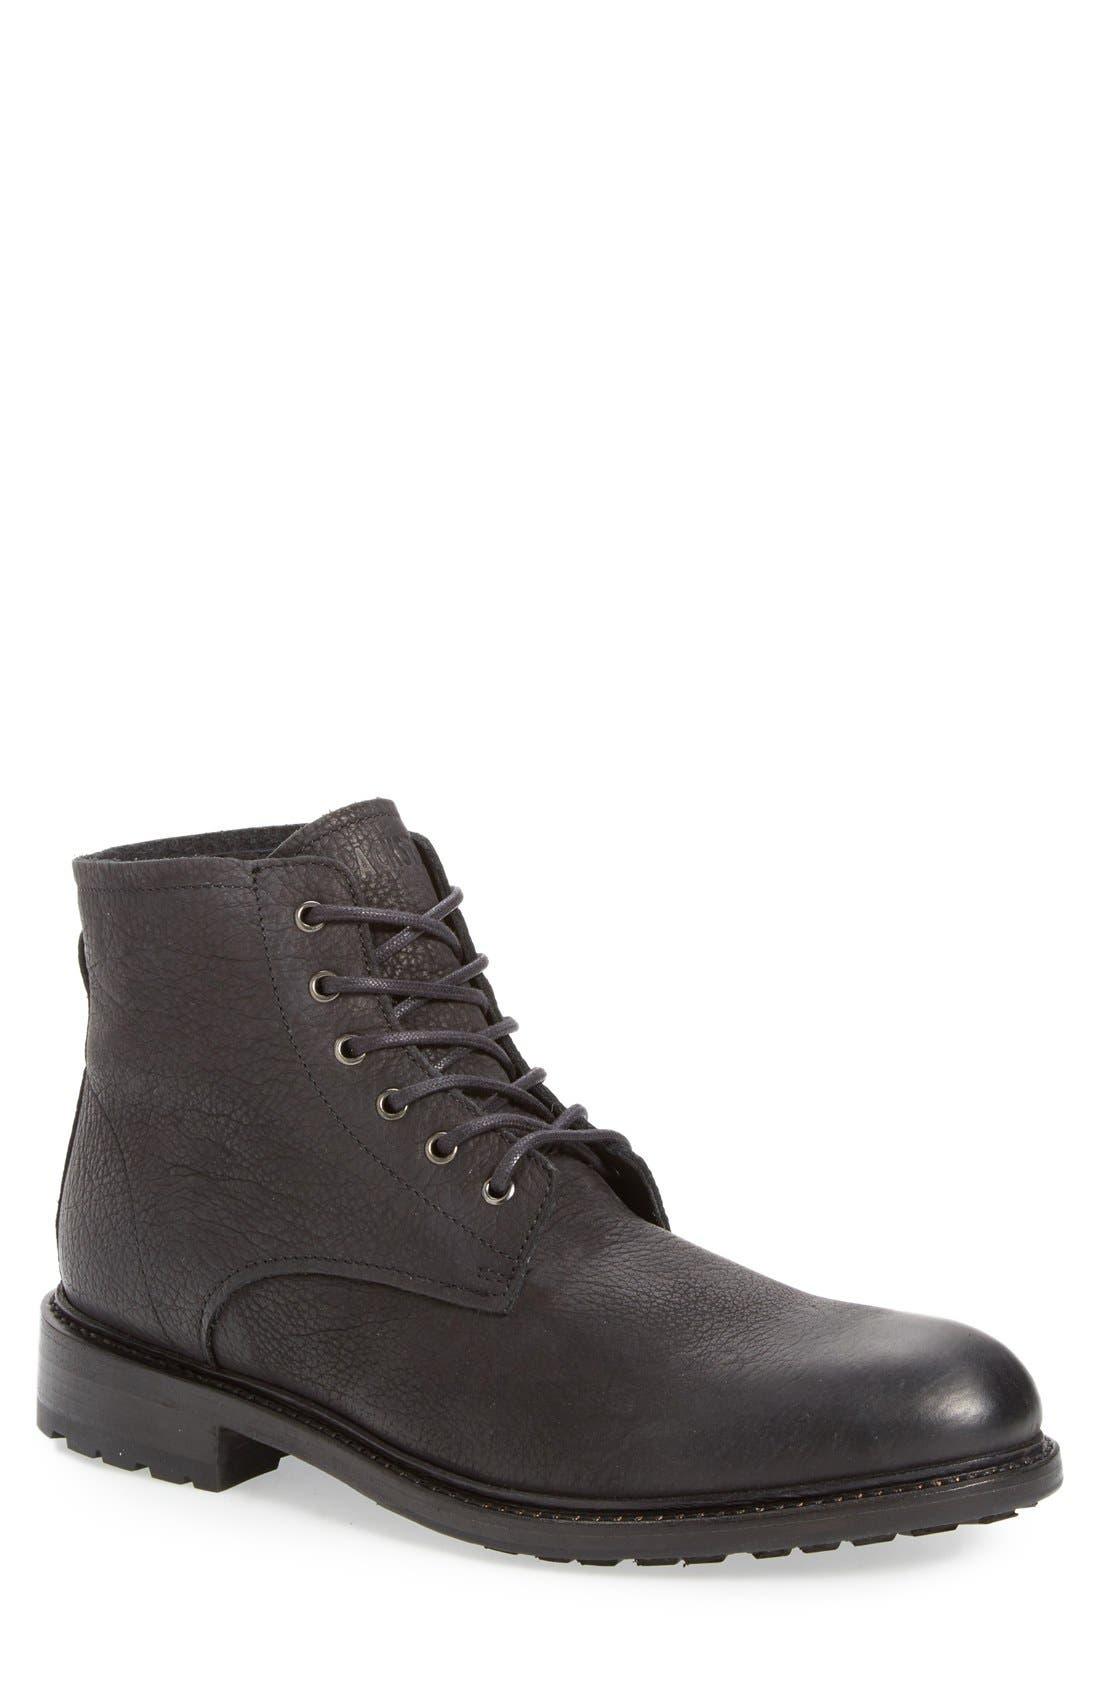 'KM32' Plain Toe Boot,                         Main,                         color, 001